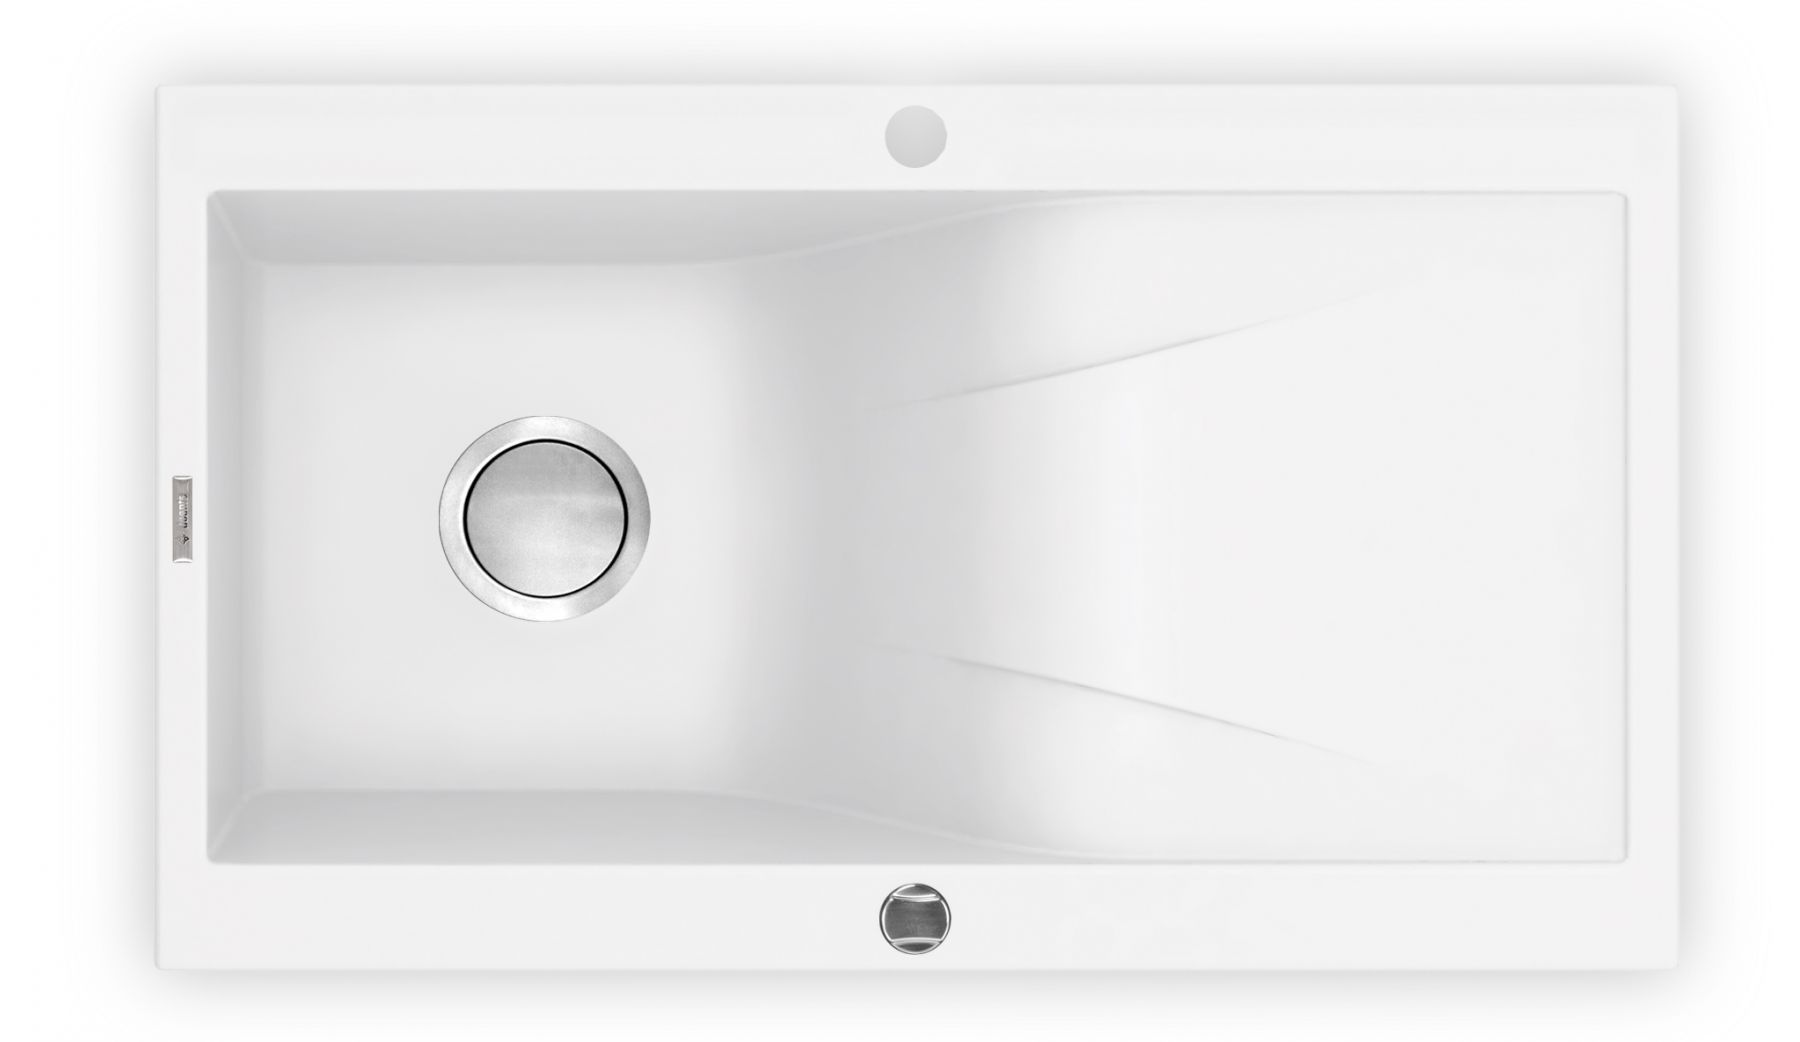 DE-Rapsodia | Composite kitchen sinks, Granite kitchen sinks and ...